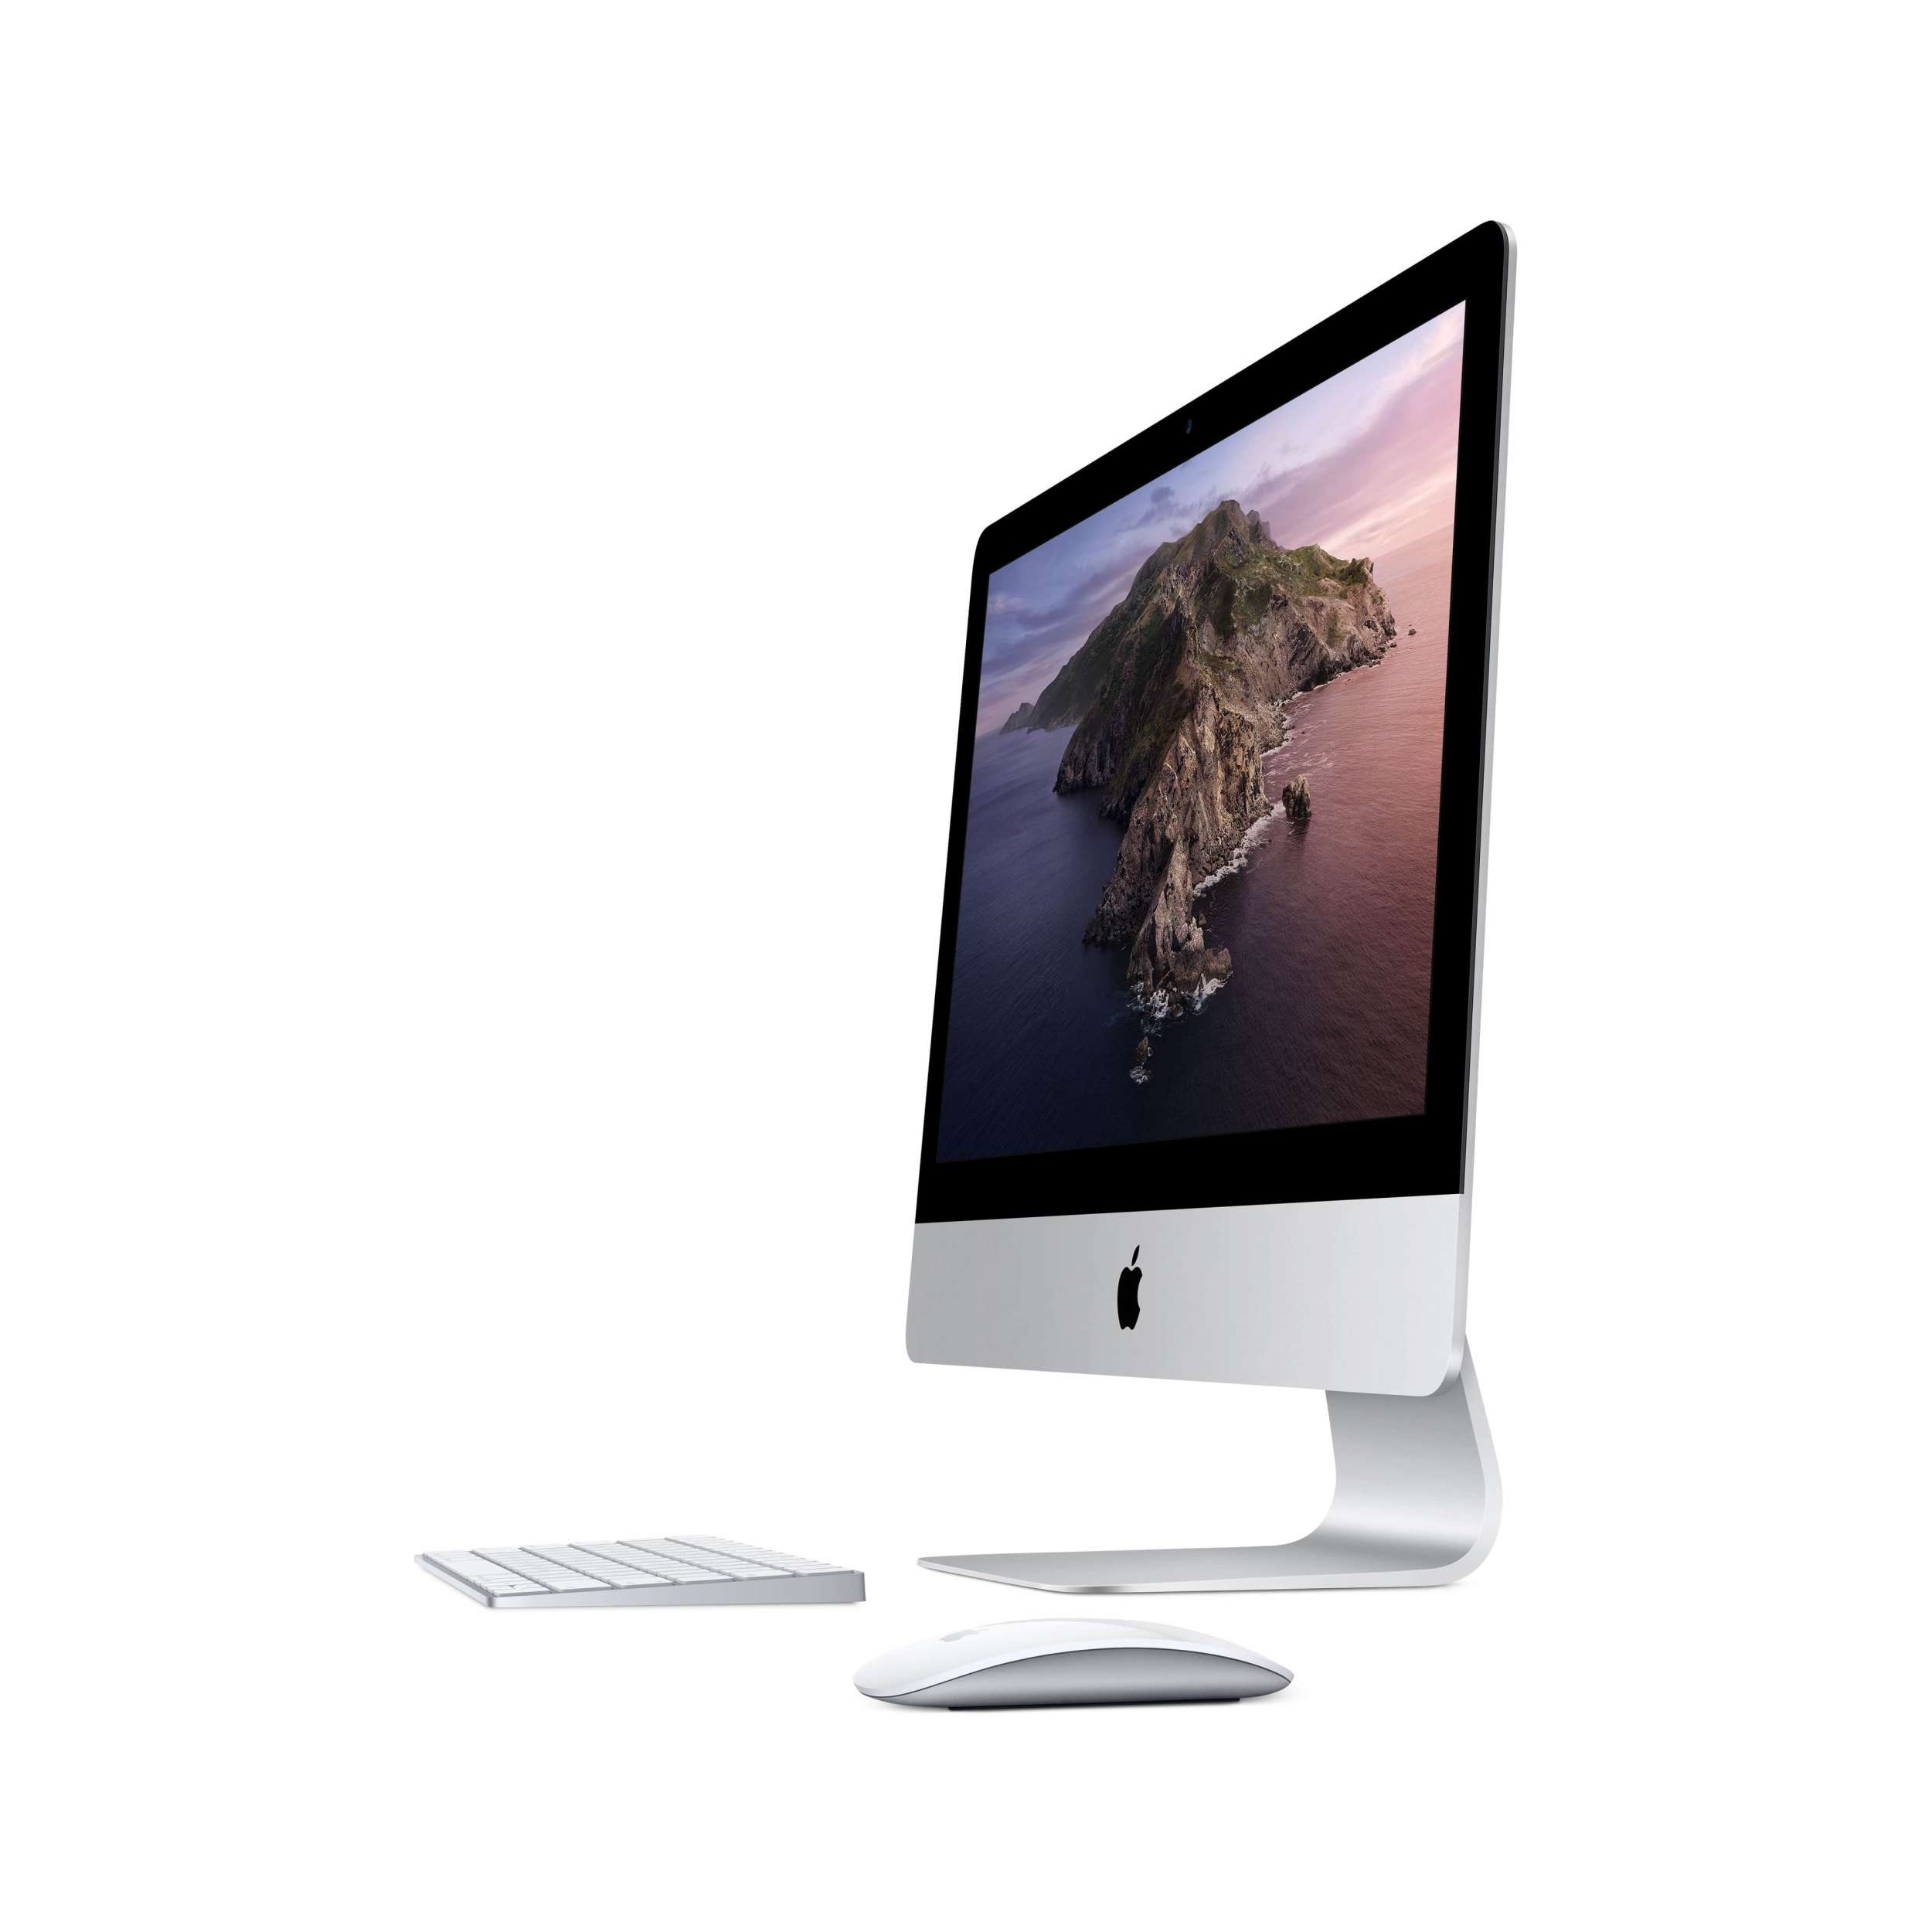 iMac 21.5 inç 4K 3.0GHz 6C i5 8GB RAM 1TB Fusion Drive 4GB Radeon Pro 560X MRT42TU/A